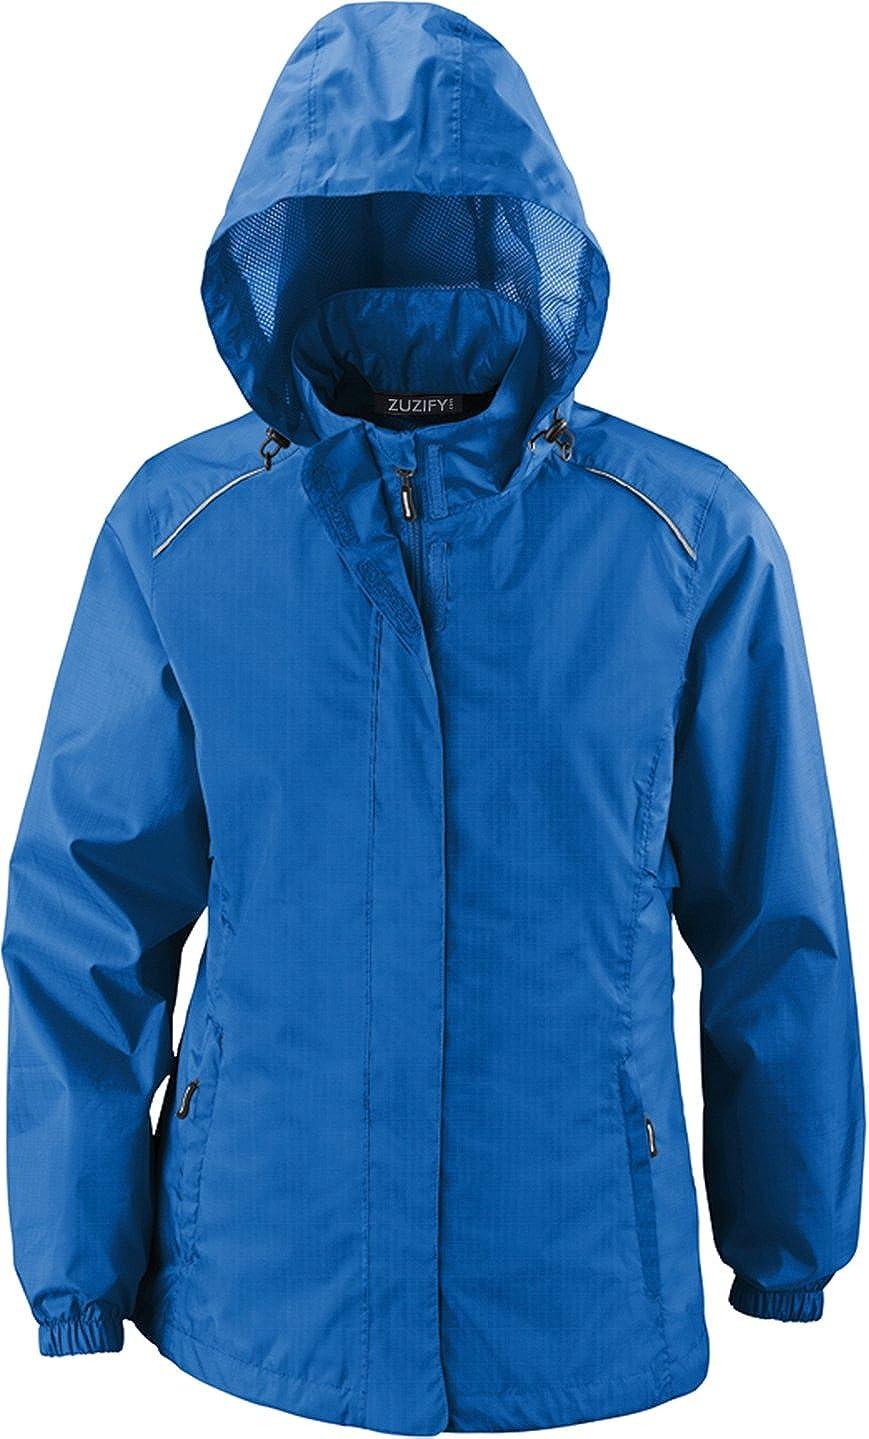 Details about  /ZUZIFY Ladies Seam-Sealed Waterproof Hooded Rain Jacket KZ0569